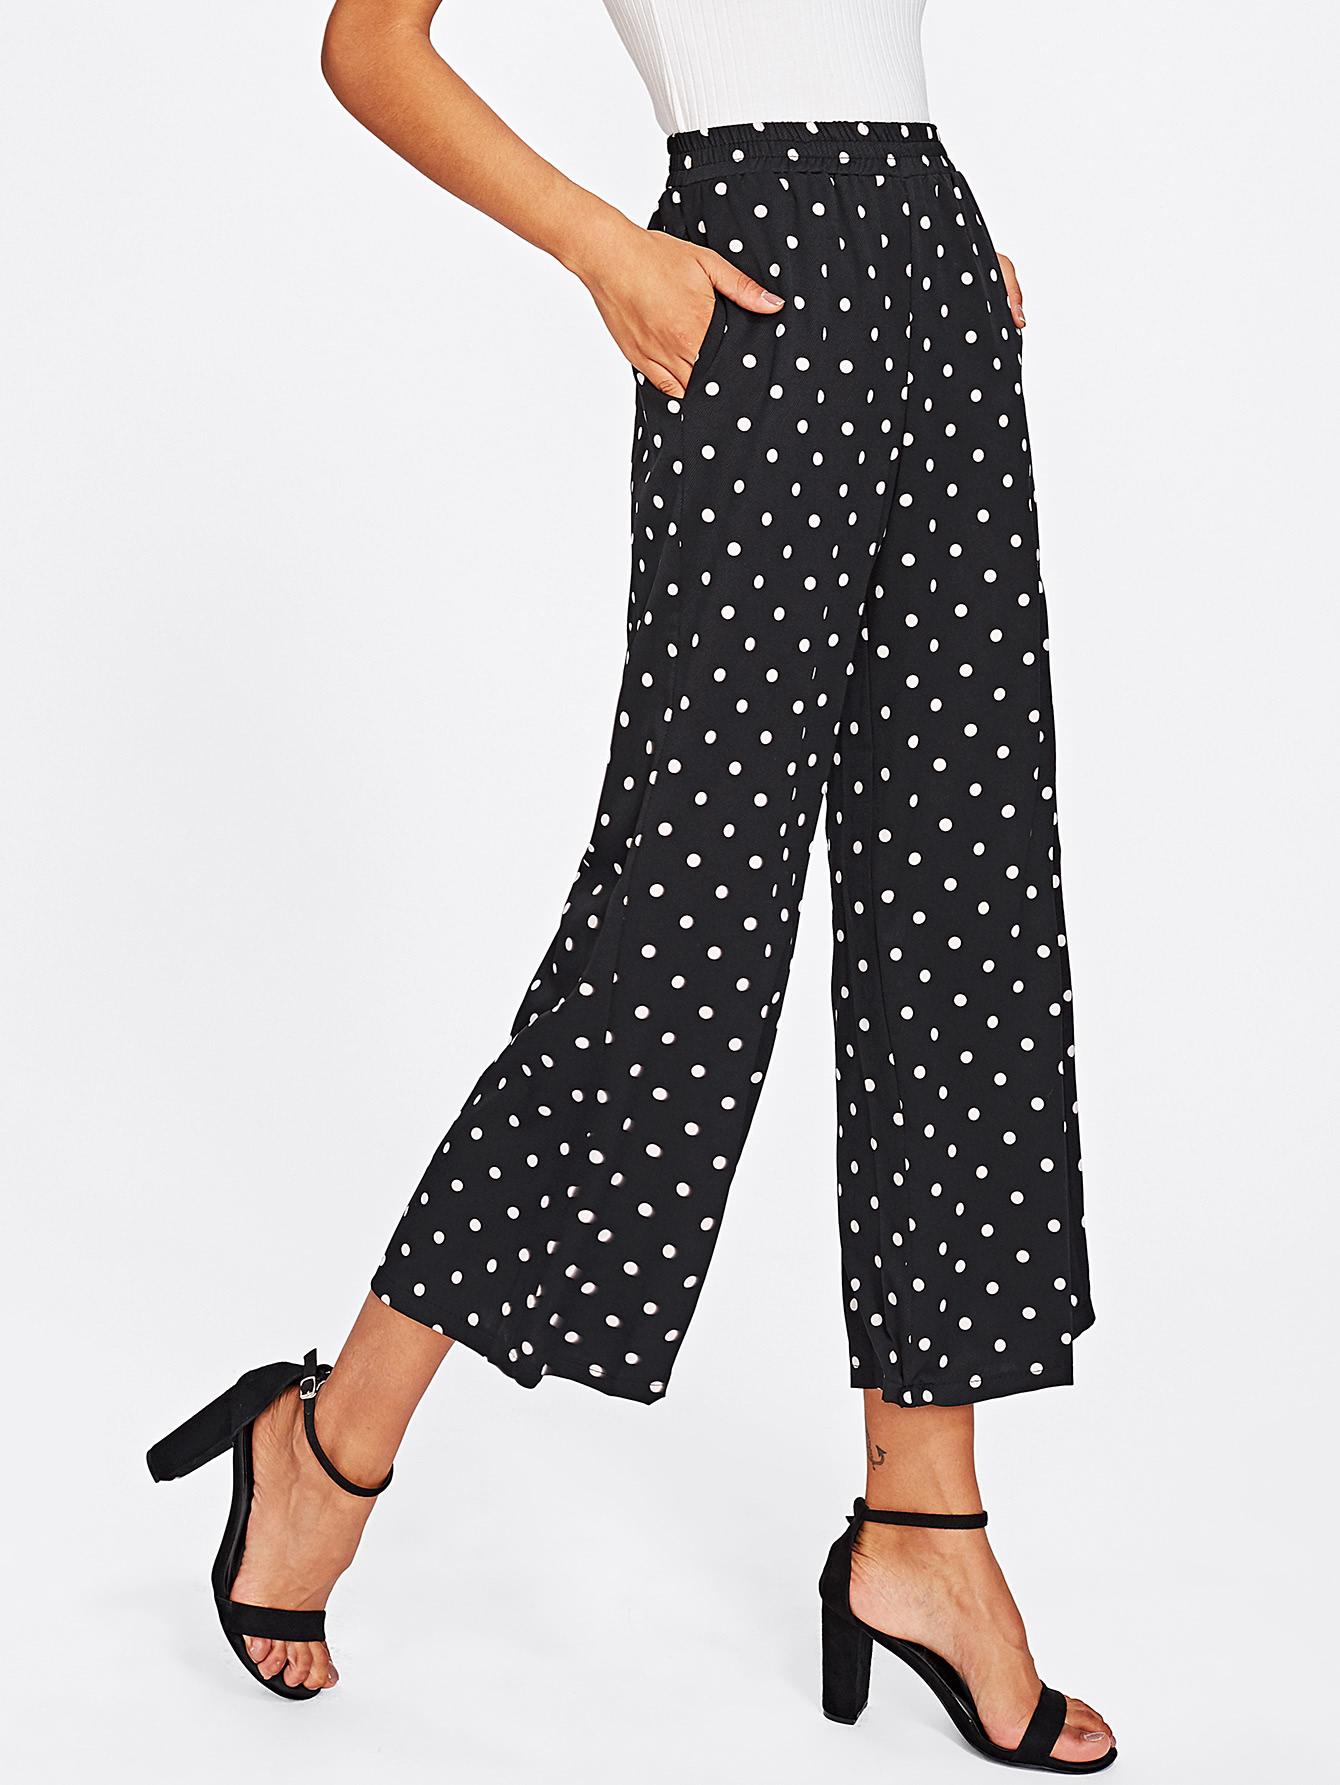 Polka Dot Wide Leg Pants